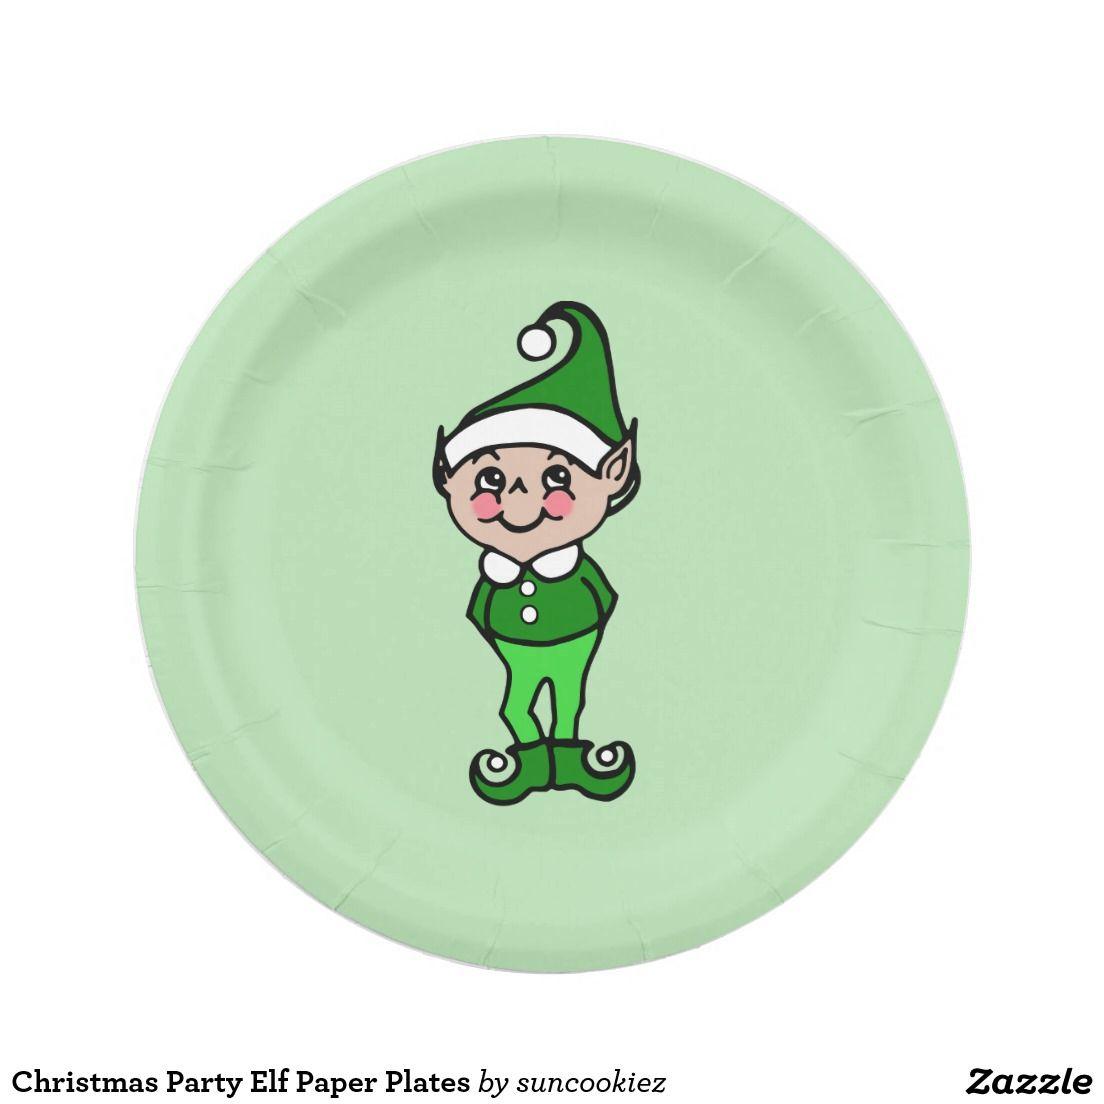 Christmas paper plates  sc 1 st  Pinterest & Christmas Party Elf Paper Plates | Christmas Paper Plates ...